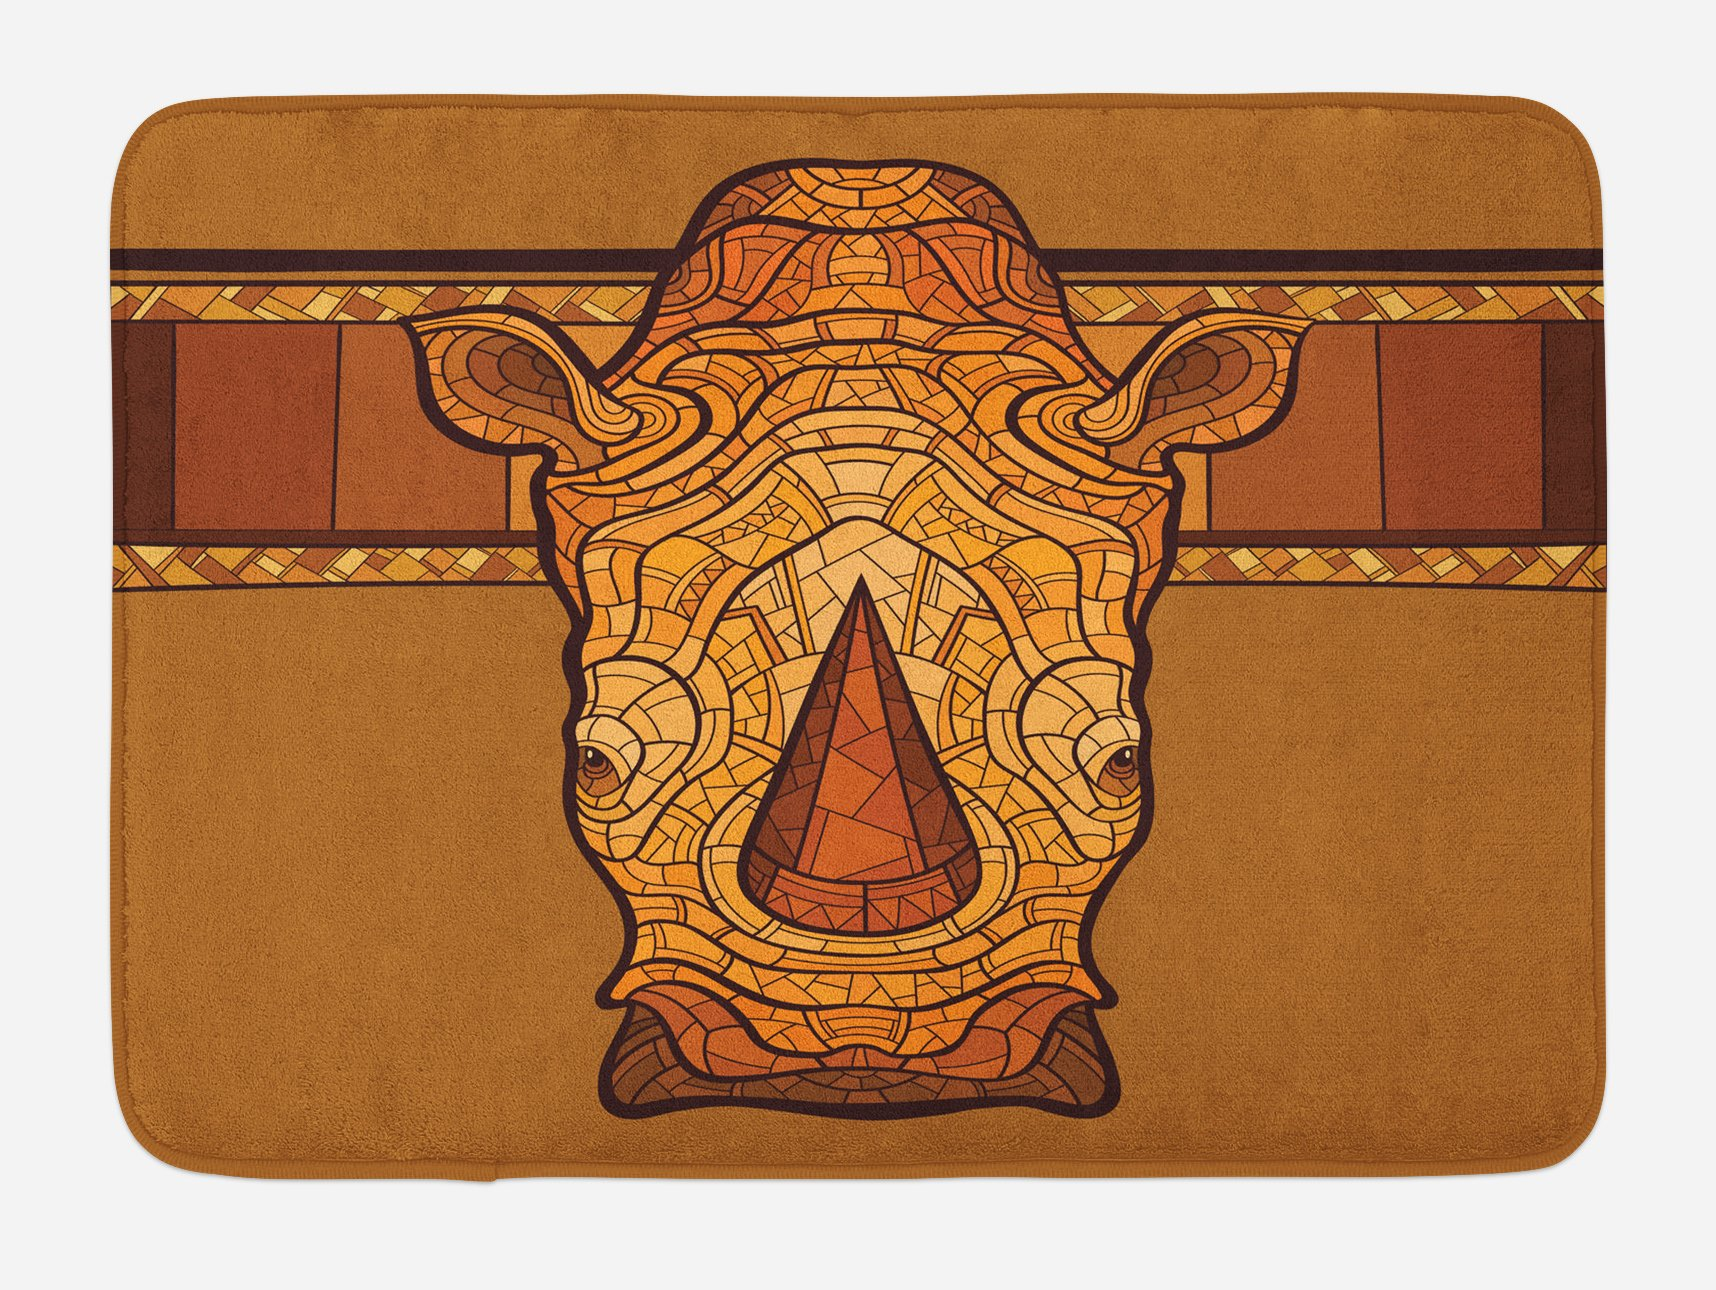 Lunarable Animal Bath Mat, Vector Illustration of a Rhinoceros Head with an Ethnic Ornament Print, Plush Bathroom Decor Mat with Non Slip Backing, 29.5 W X 17.5 W Inches, Cinnamon Pale Coffee